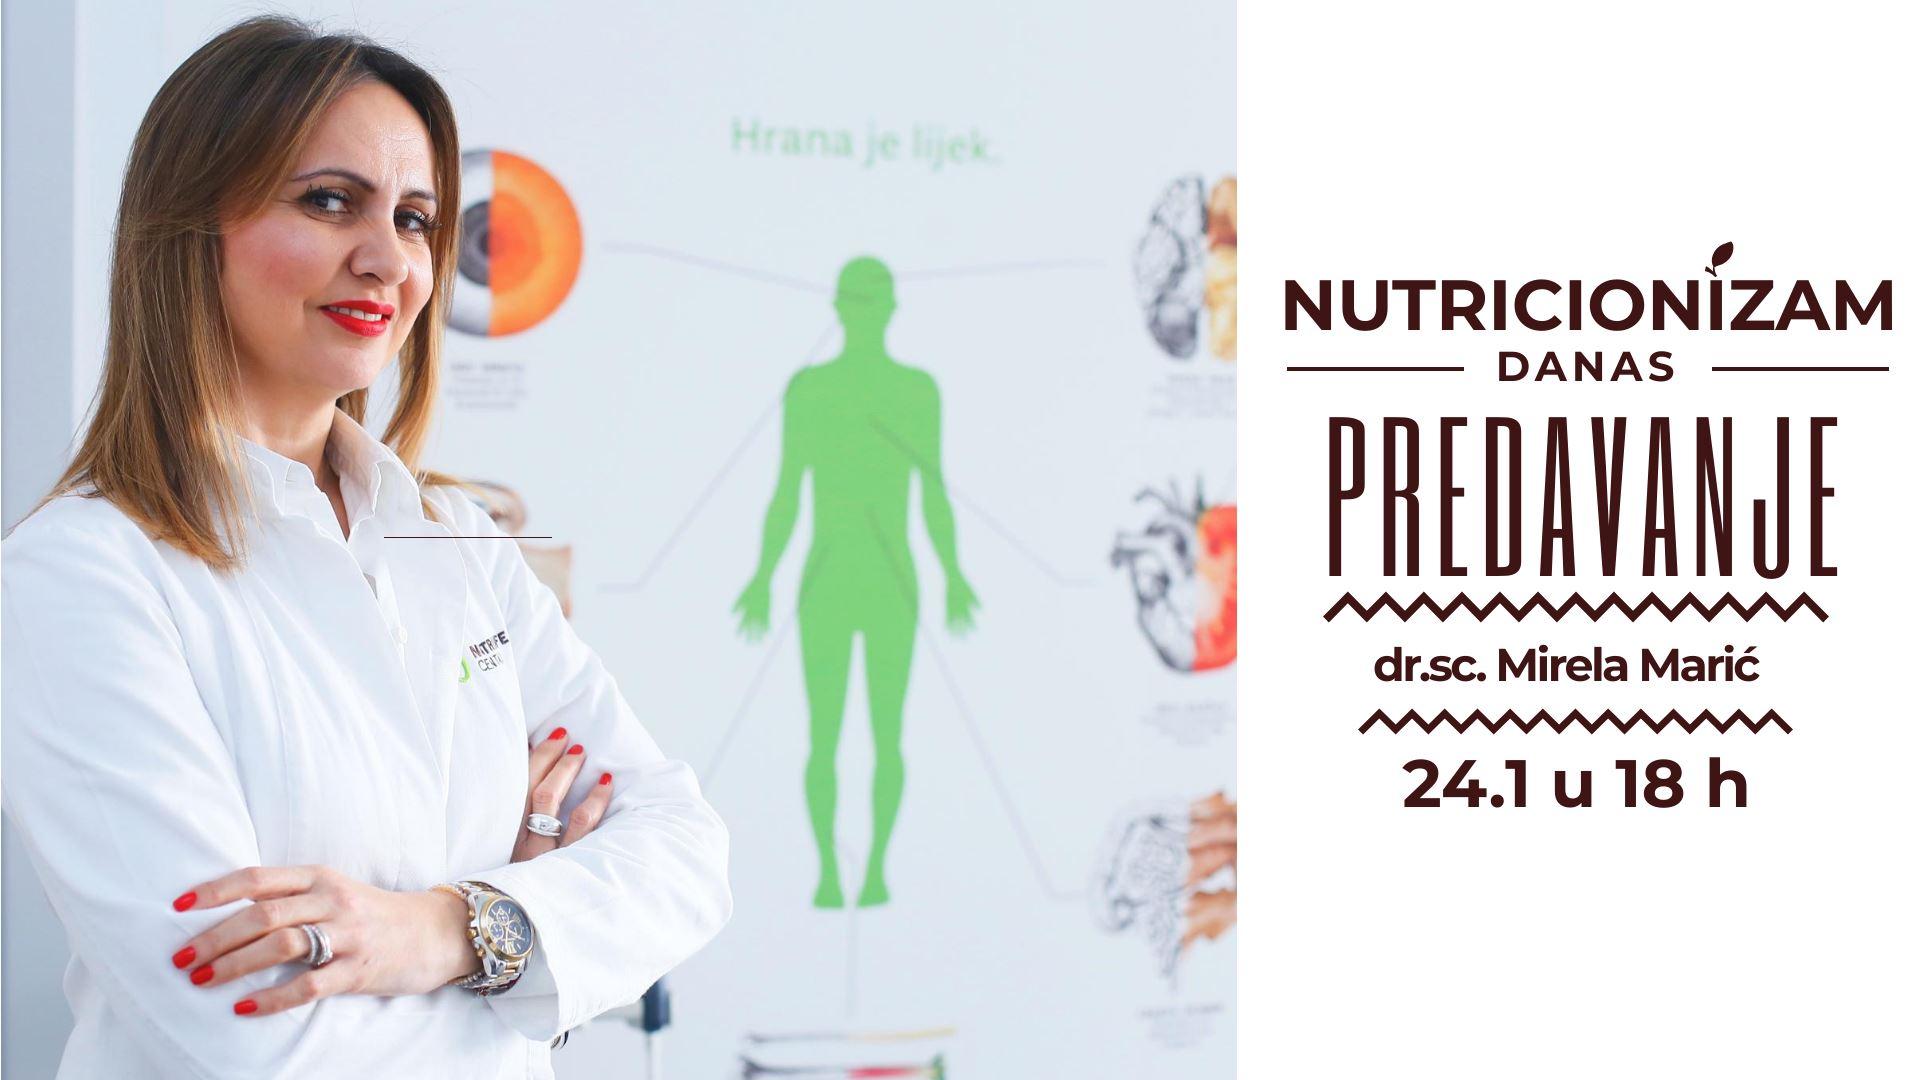 Predavanje nutricionistice novog doba dr.sc. Mirele Marić